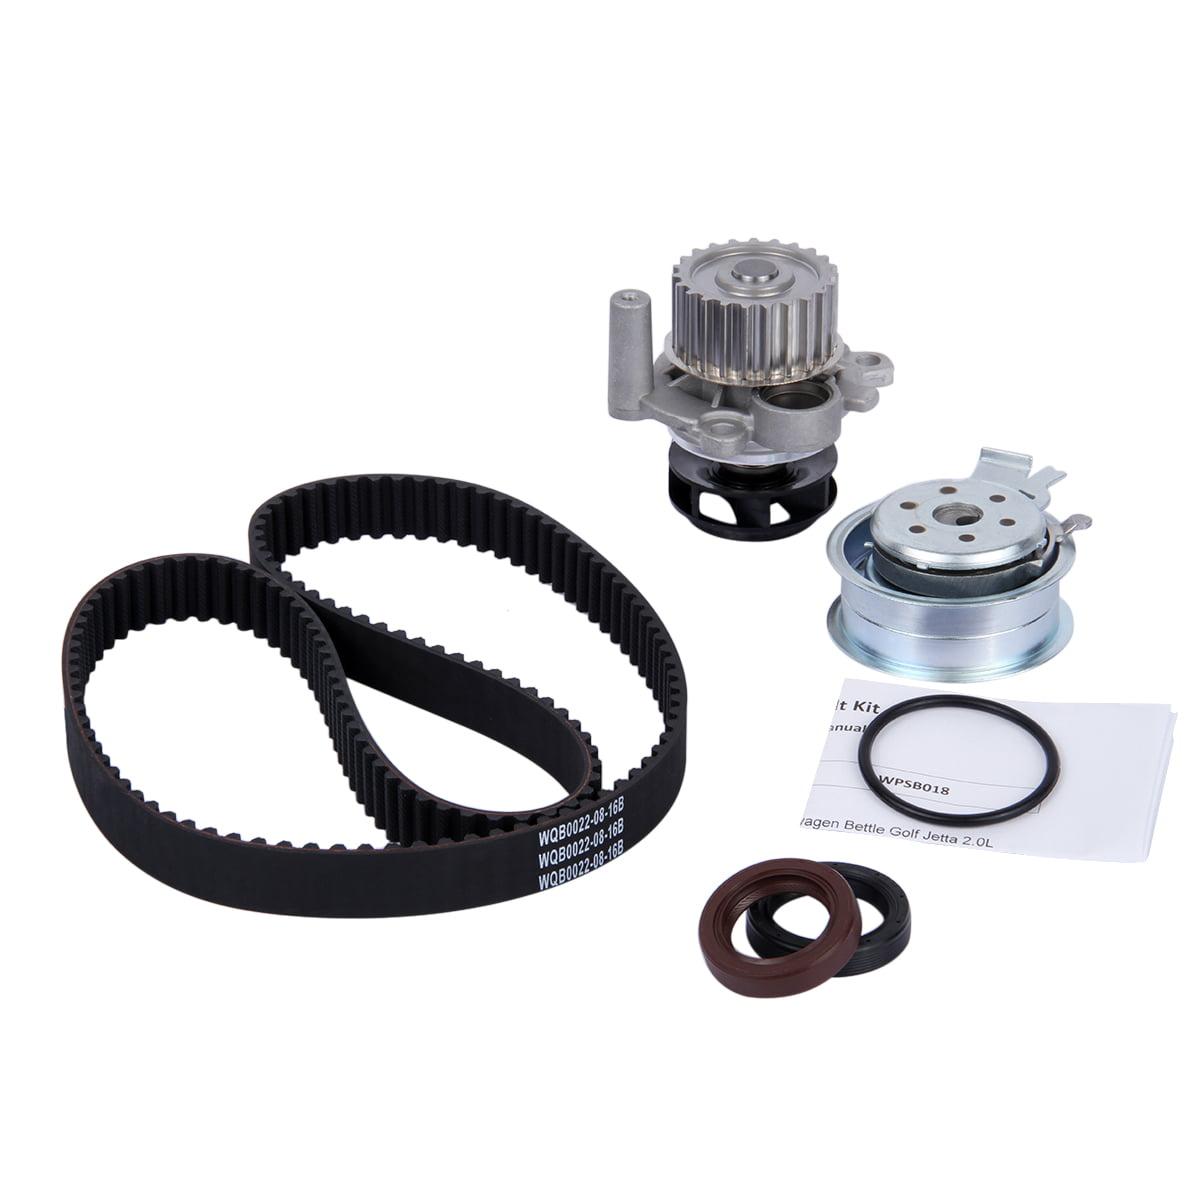 Engine Timing Belt Water Pump Kit For 98-05 Volkswagen Beetle Golf Jetta 2.0L AVH AZG AEG BEV by Unbranded